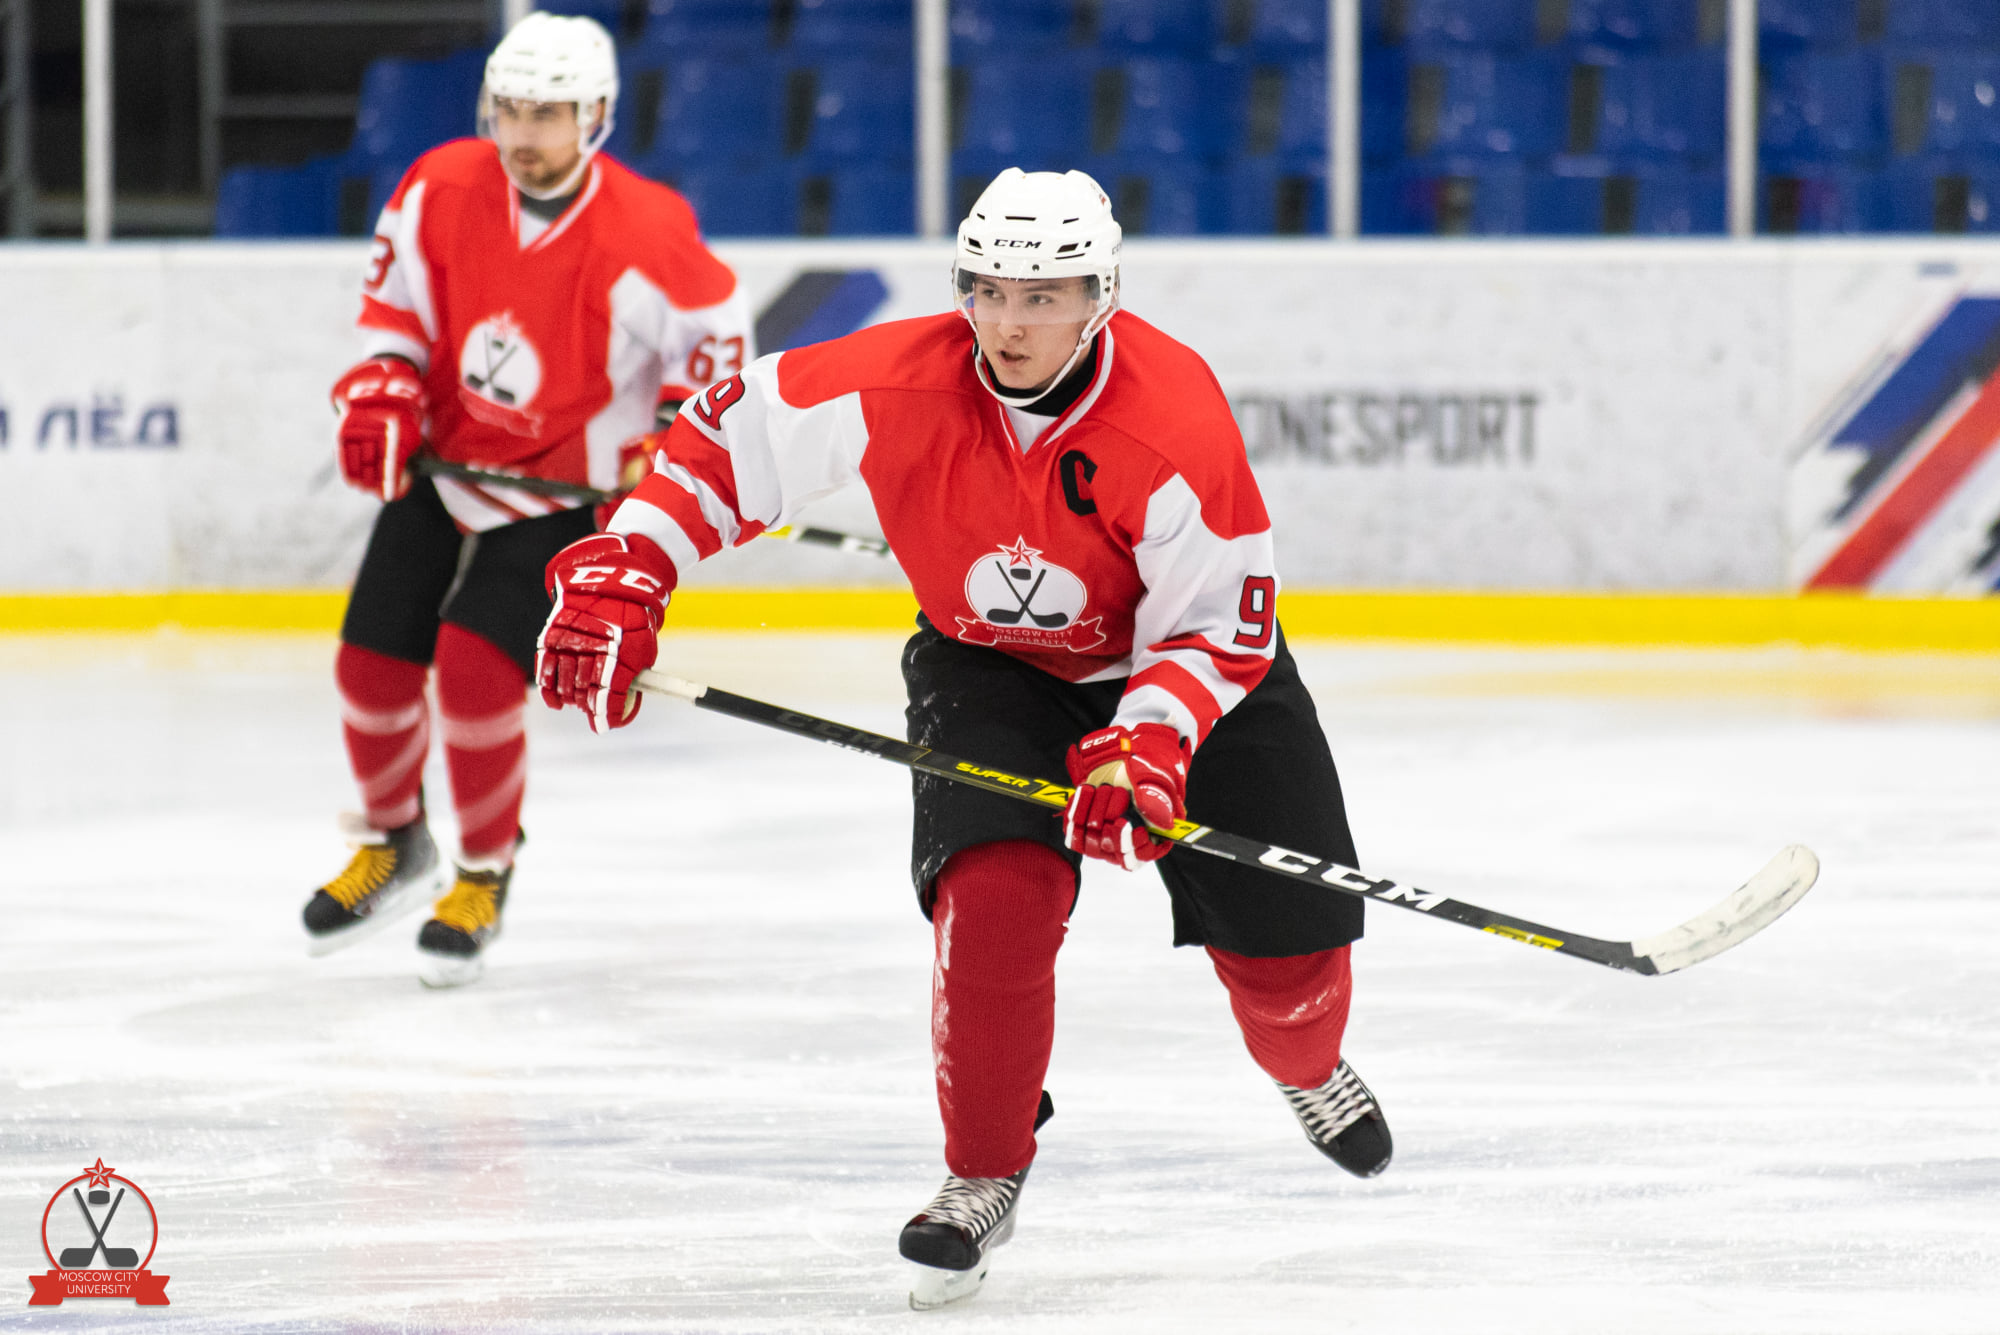 The MCU hockey team debut brilliantly